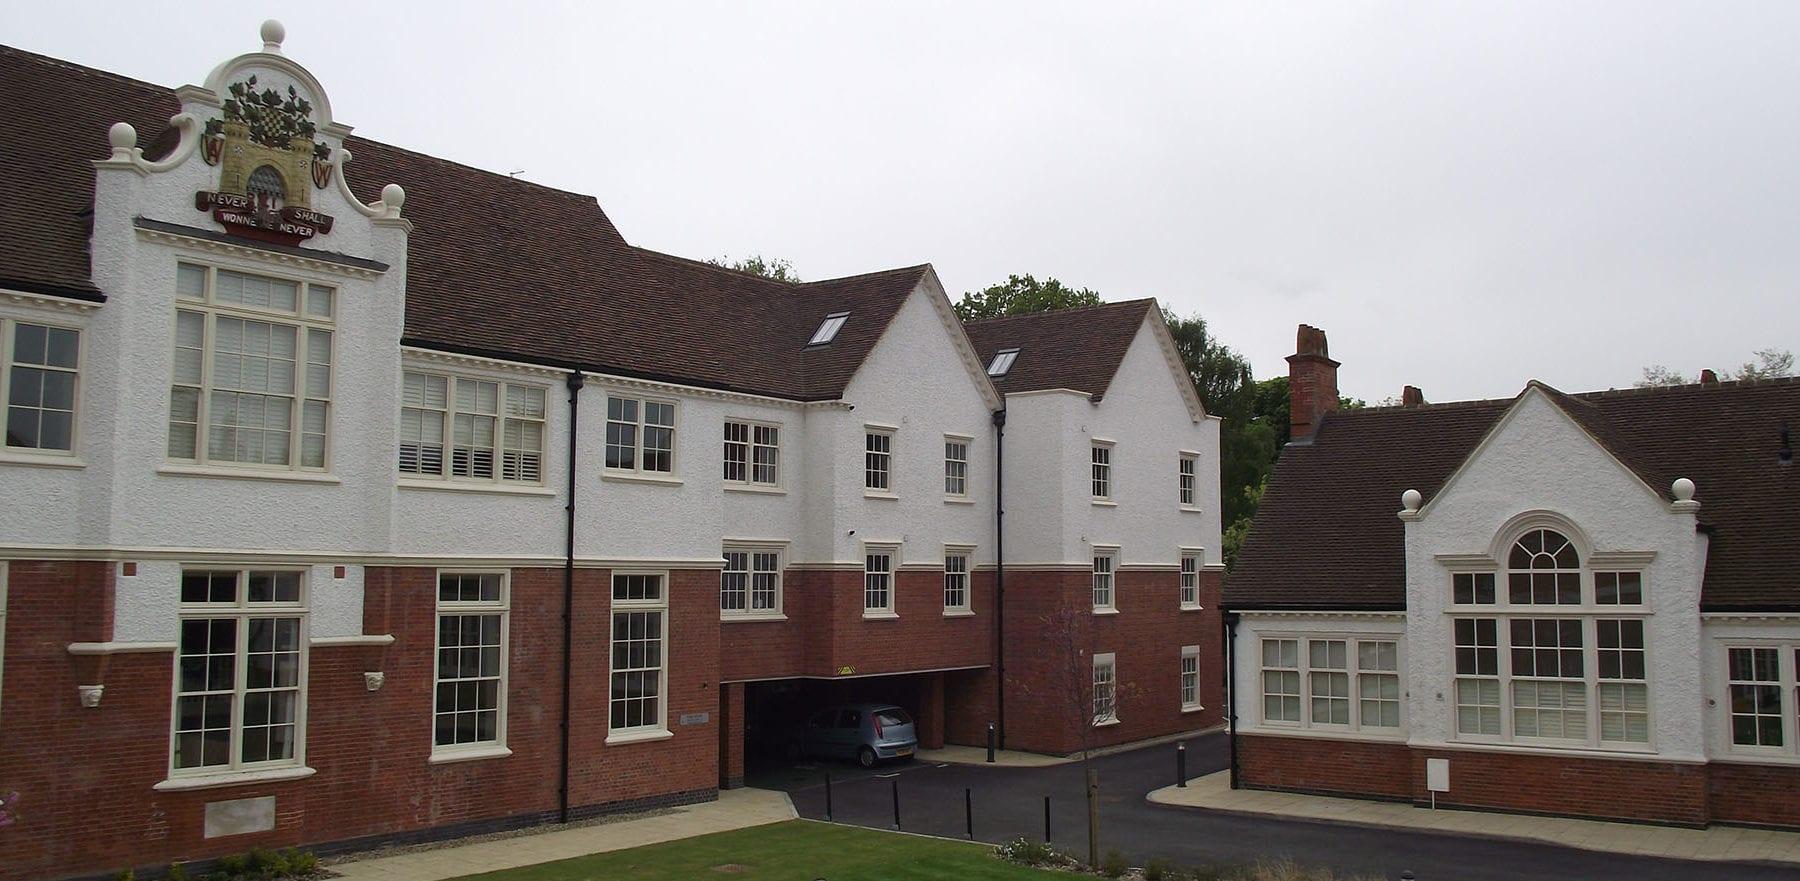 Lifestiles - Handmade Restoration Clay Roof Tiles - Redhill, England 2